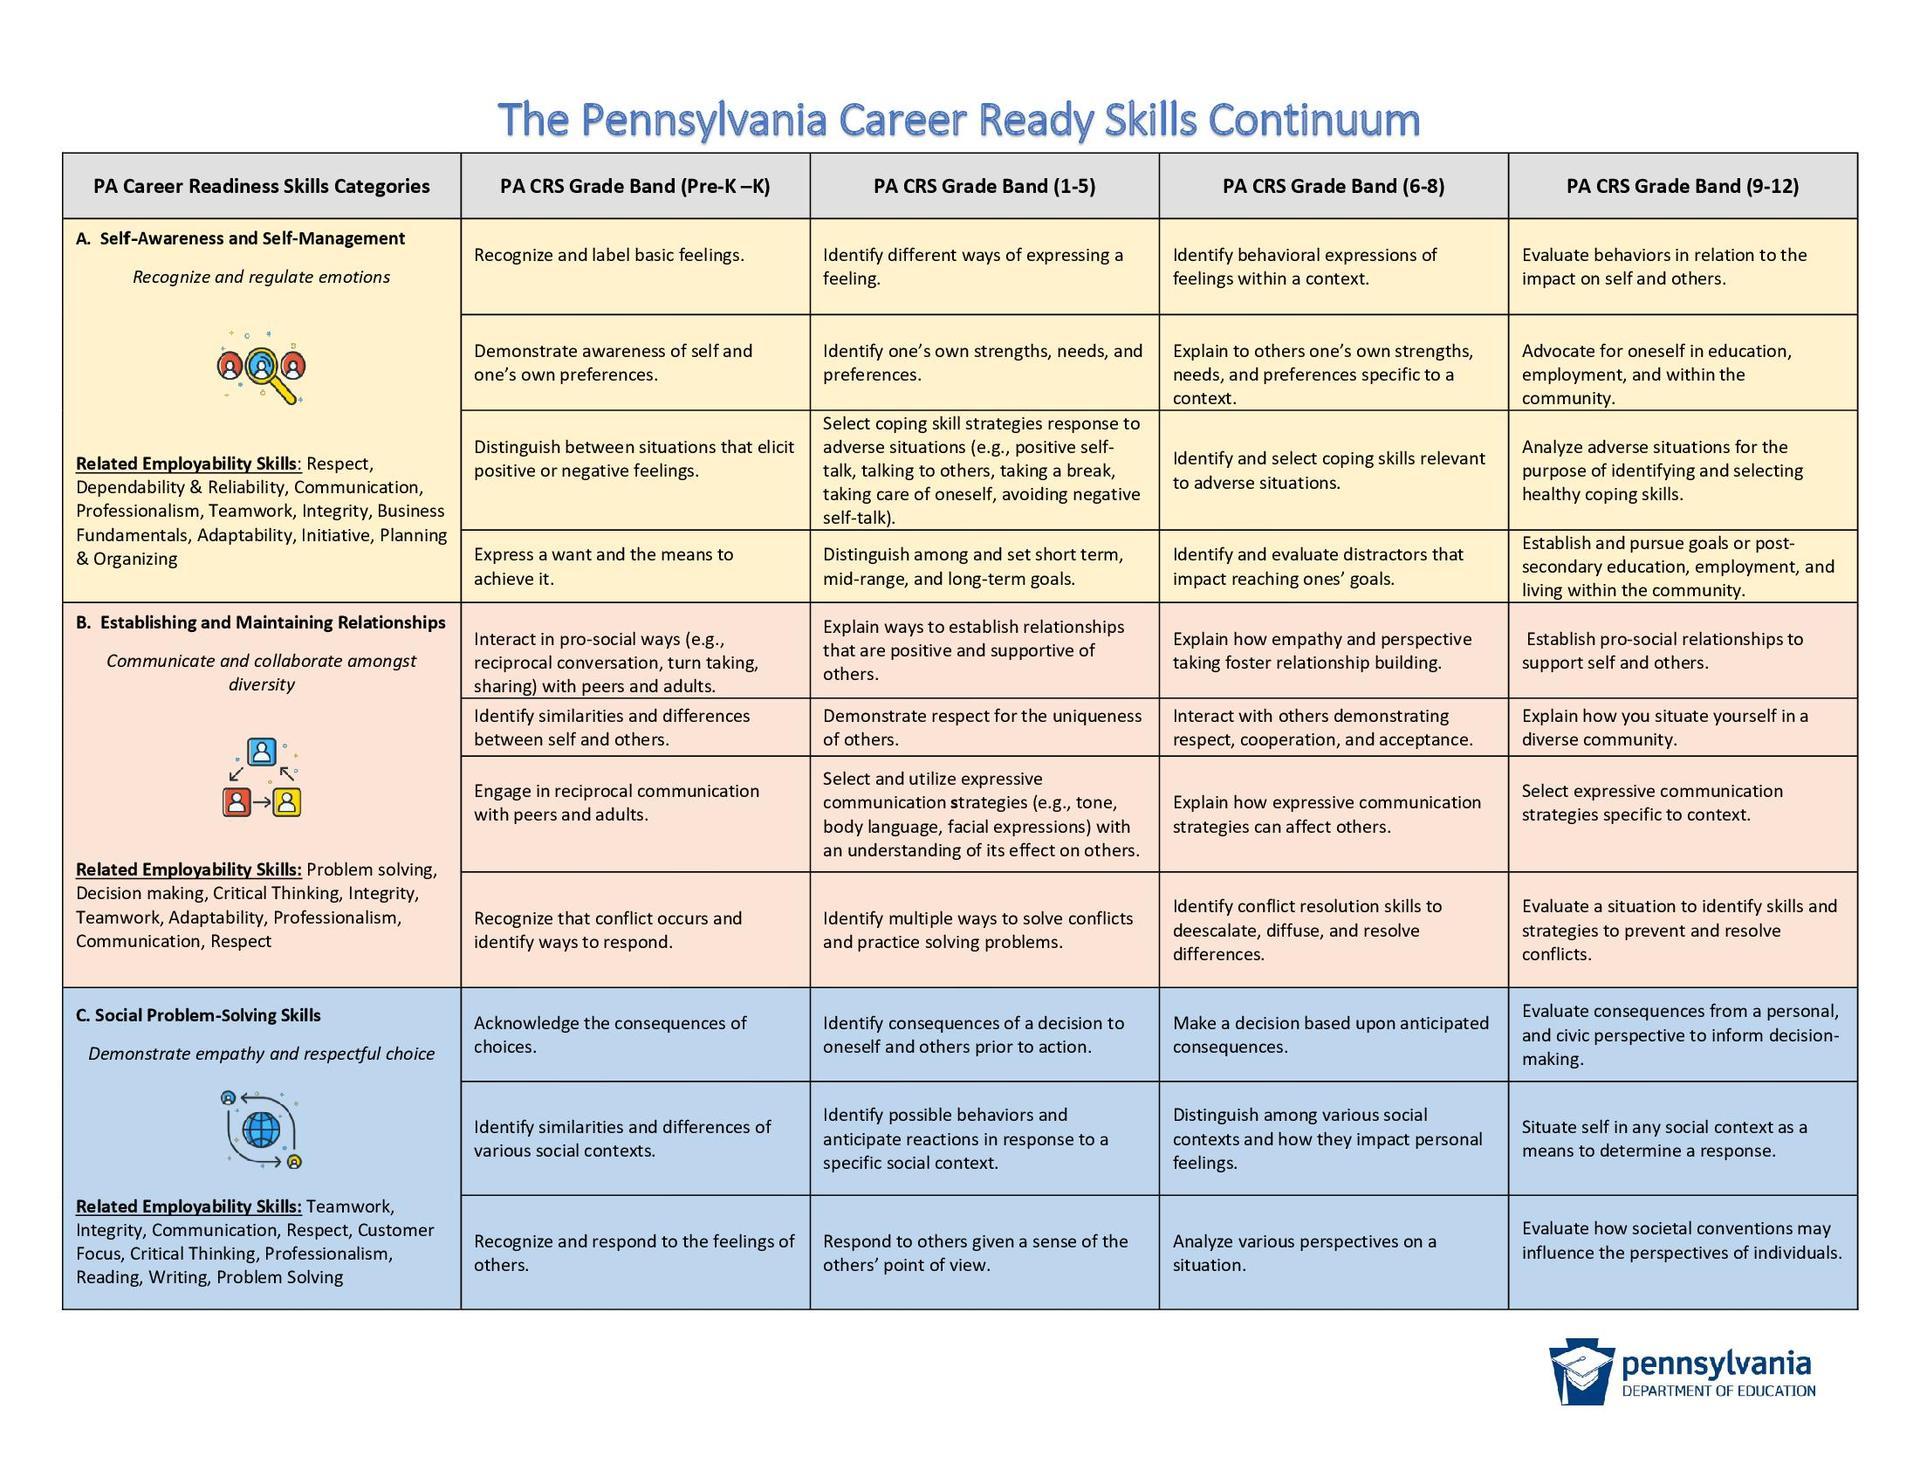 PA Career Readiness Continuum